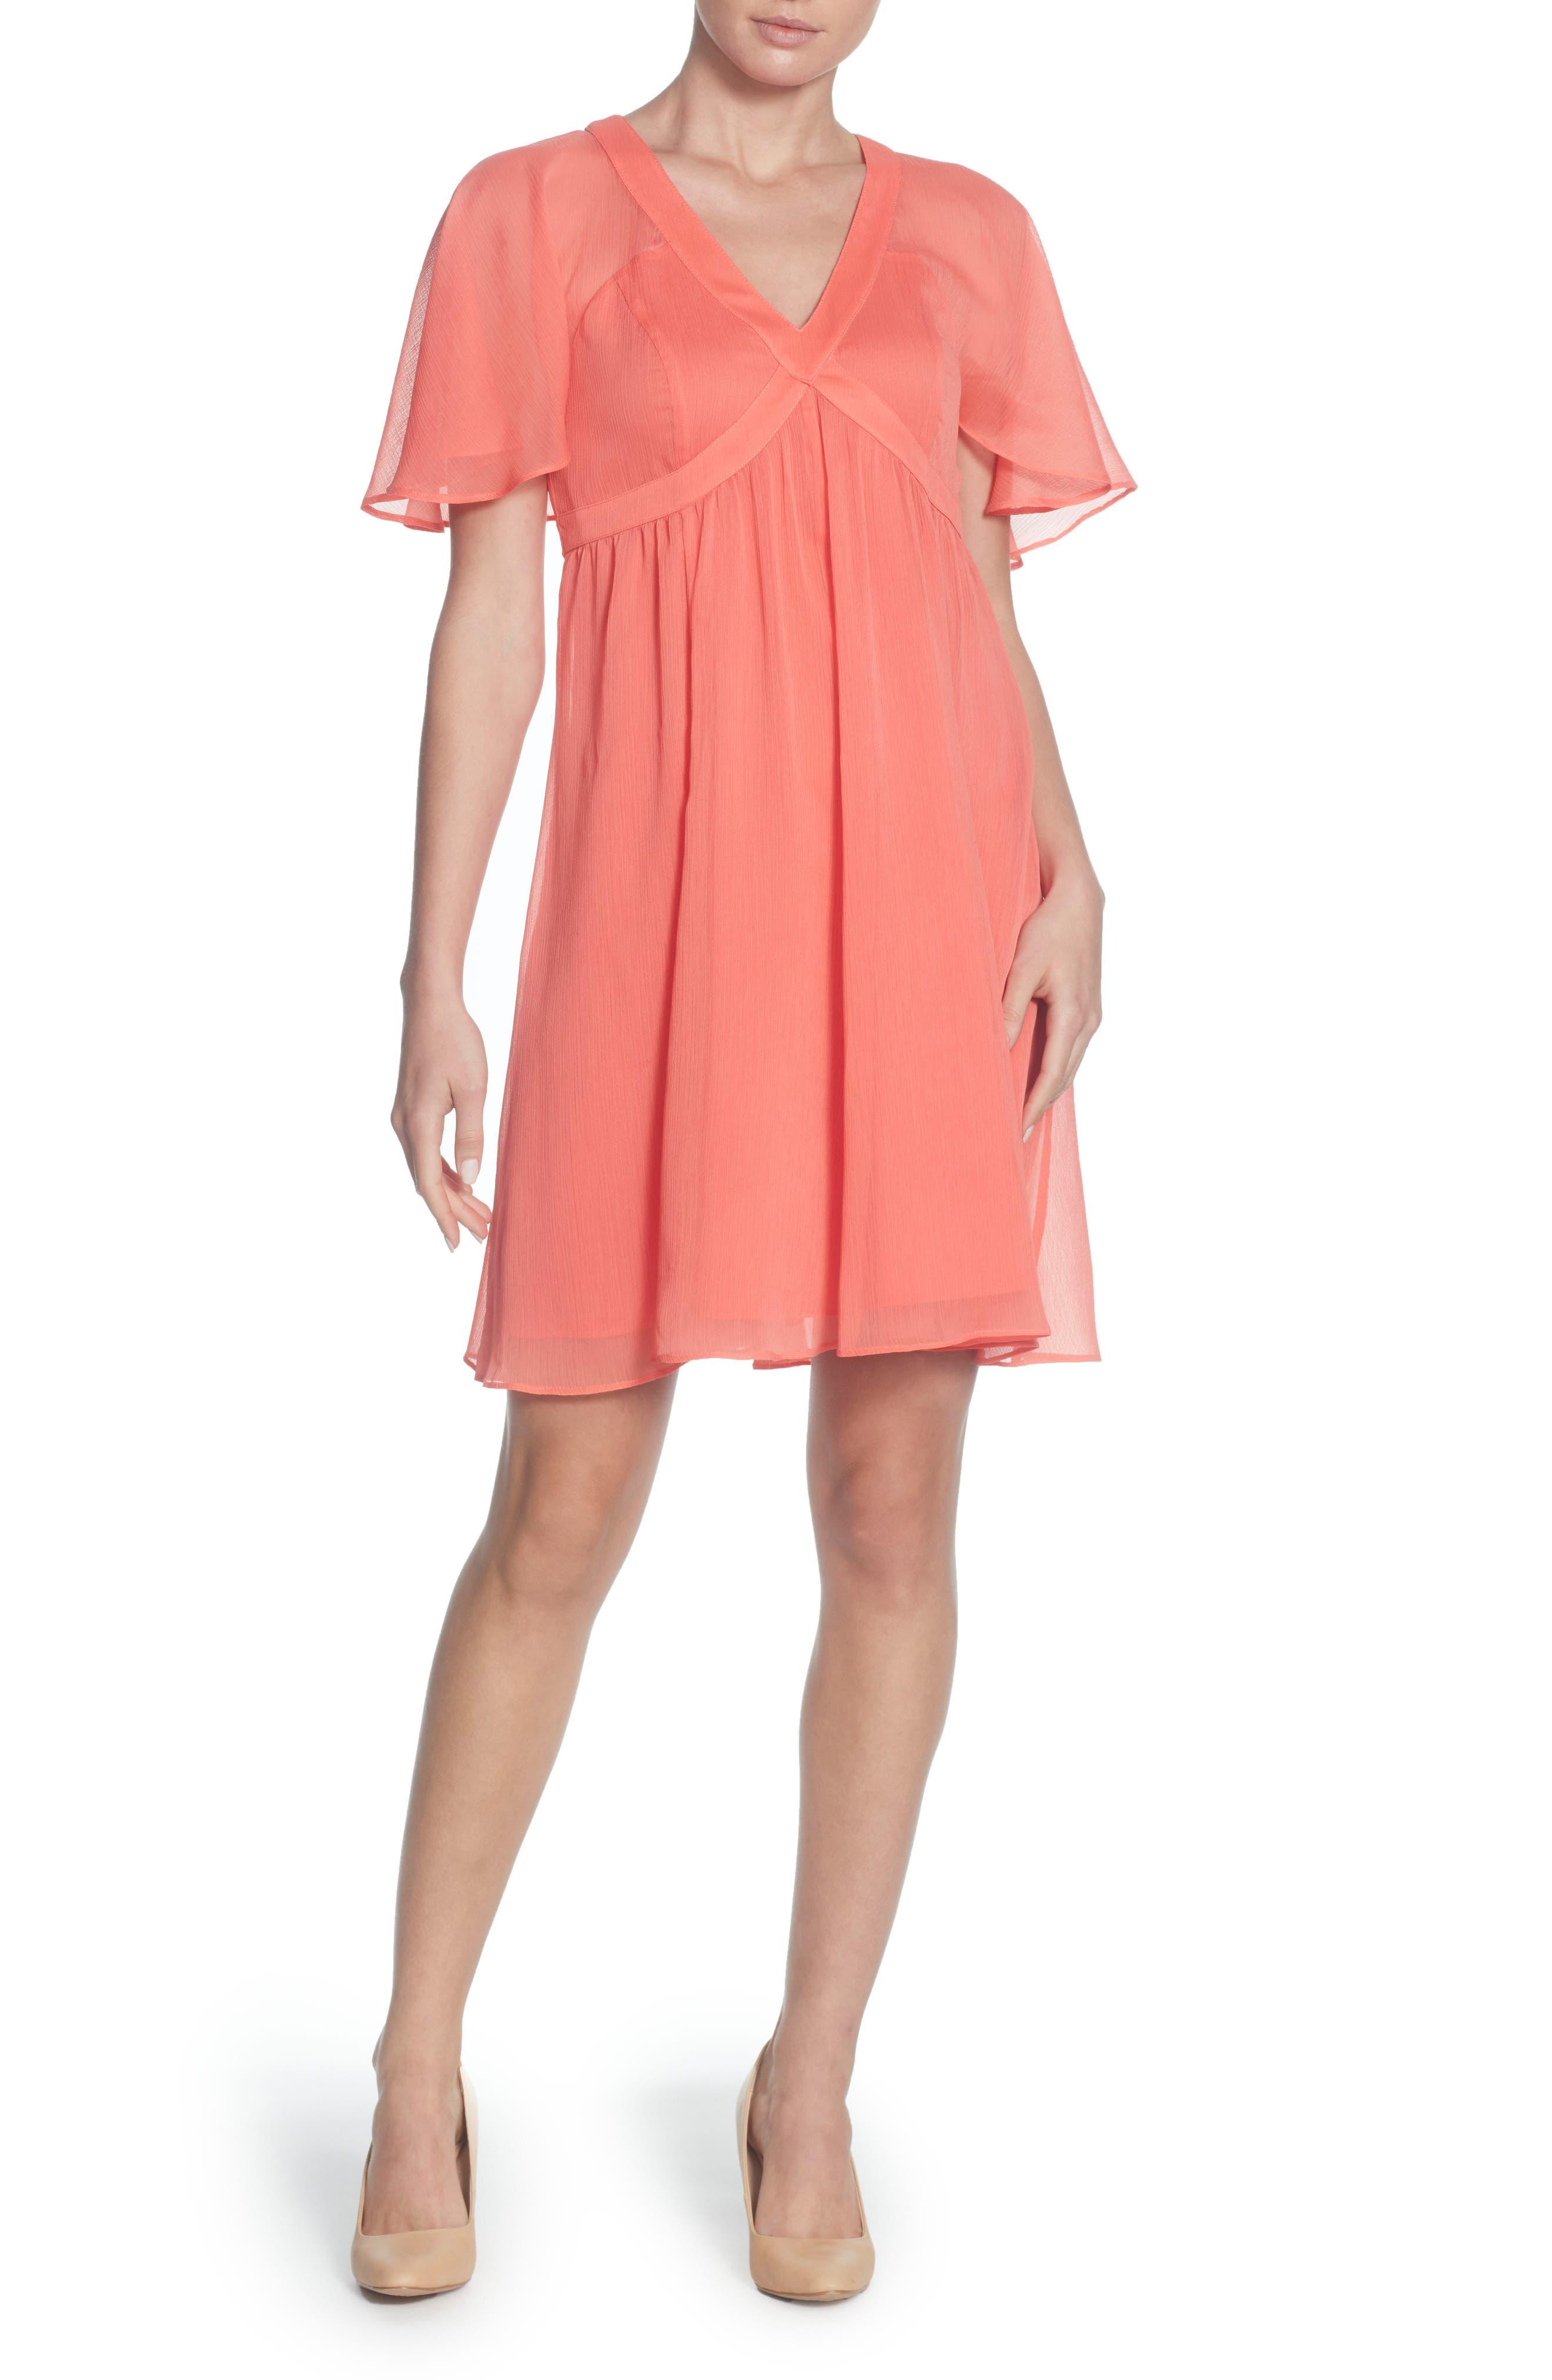 Odom Skater Dress,                         Main,                         color, 695